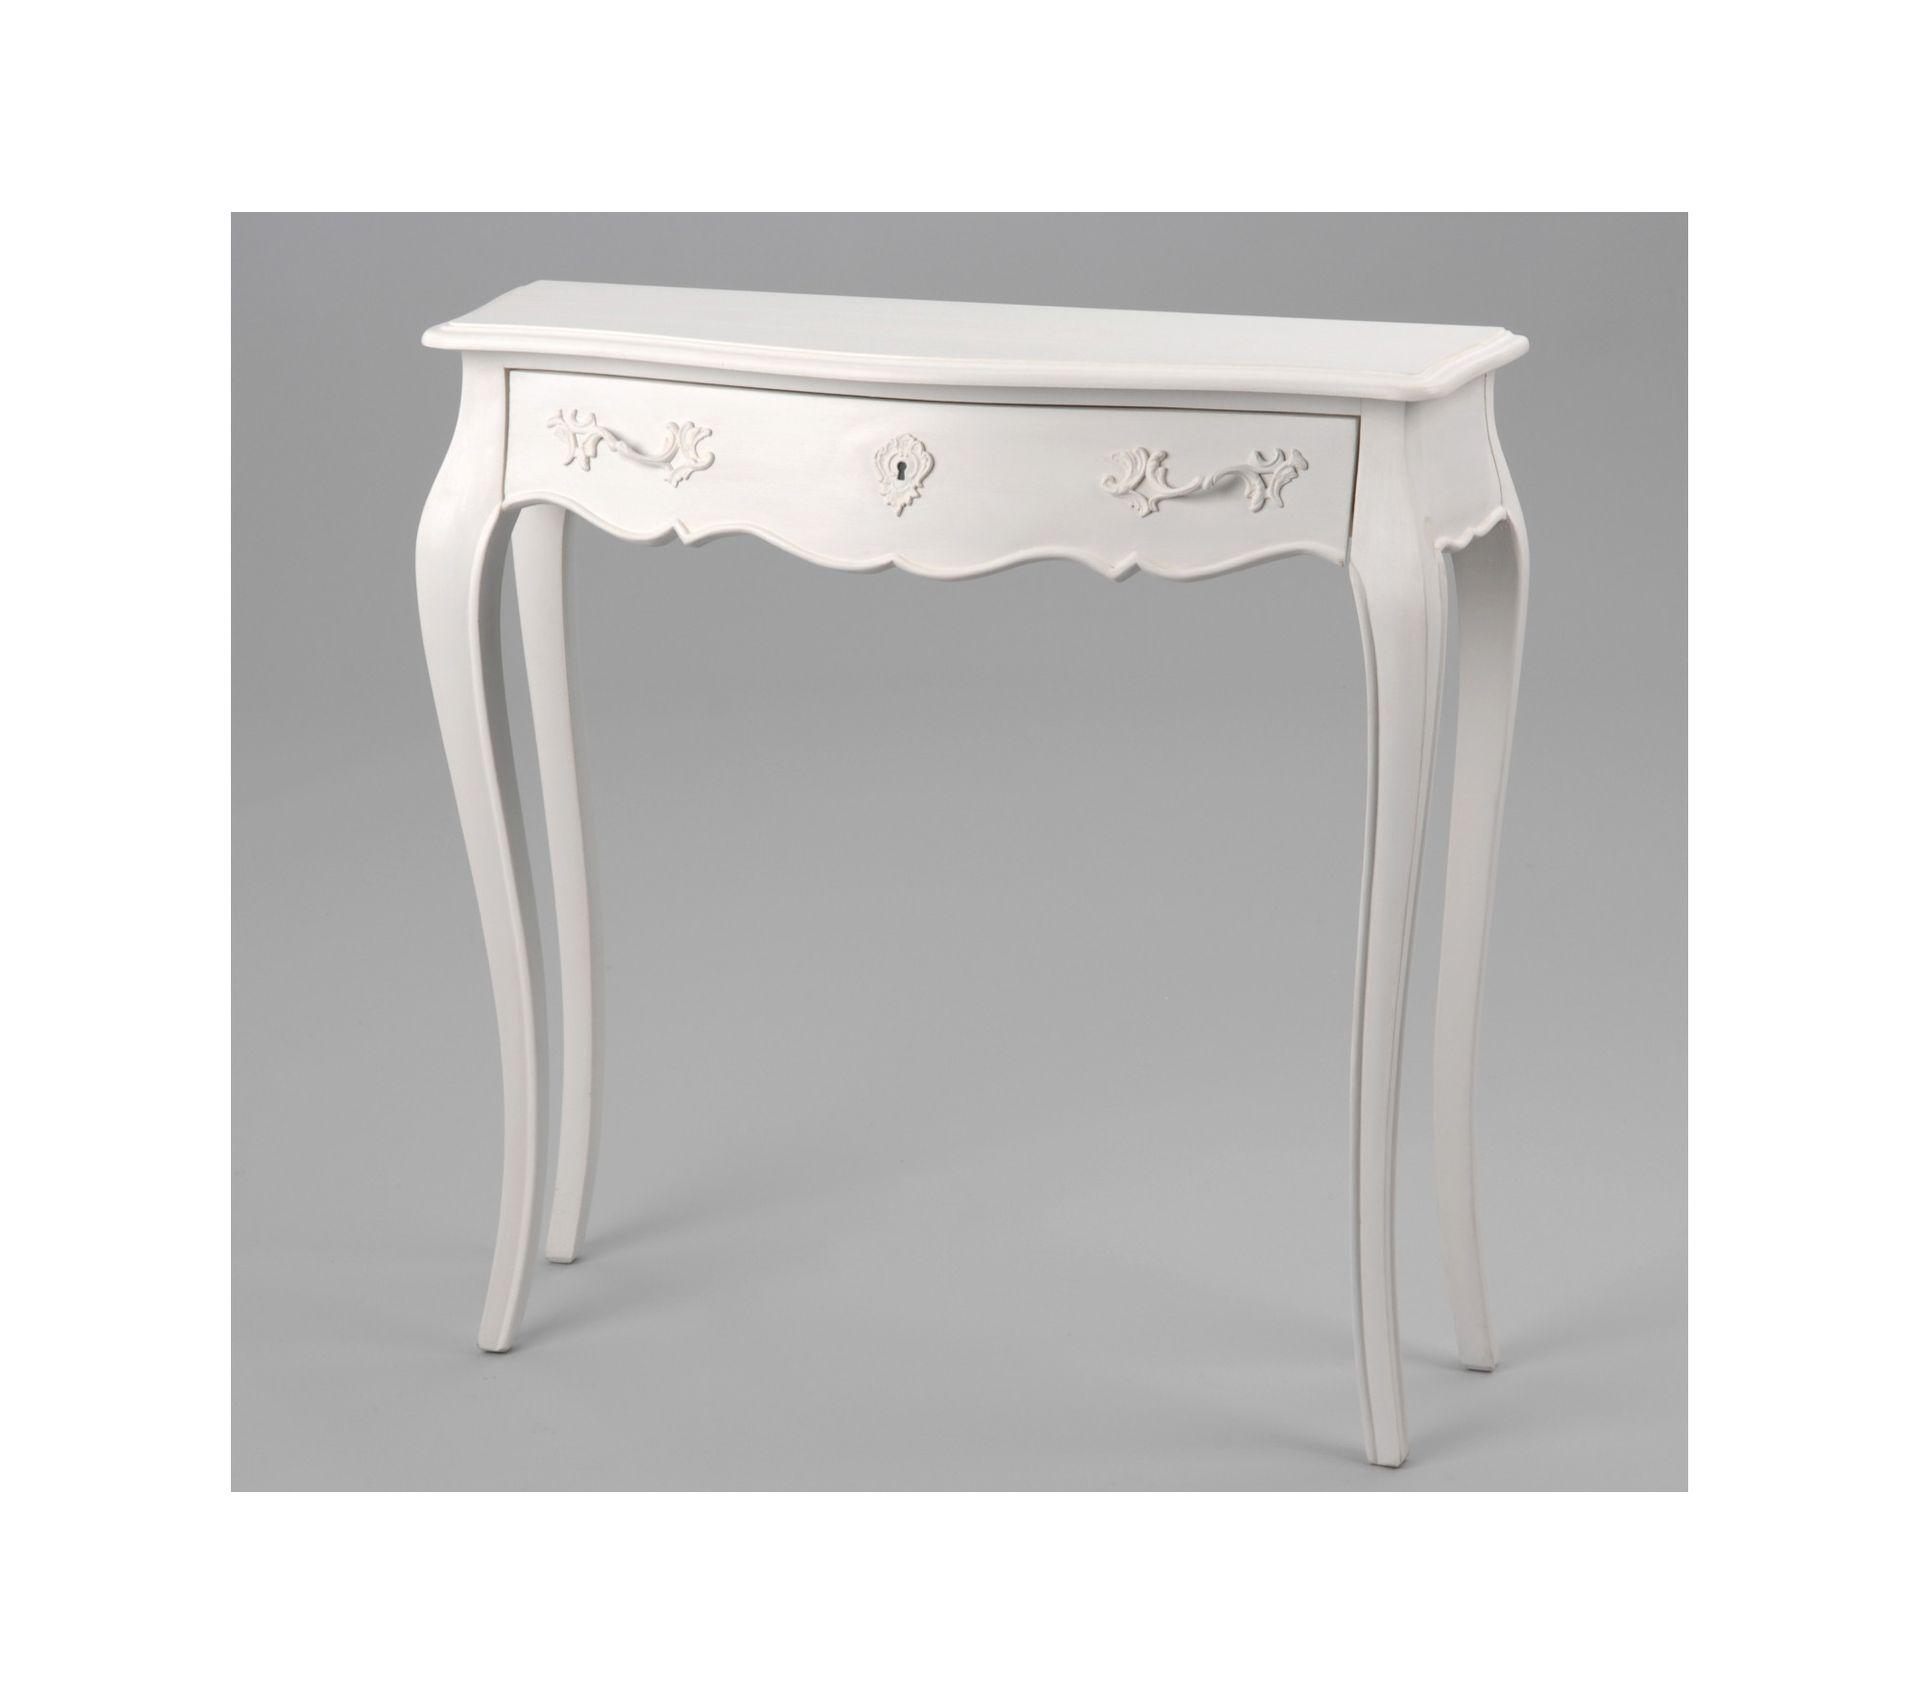 Console Blanche En Bois Mdf Murano Table Console But